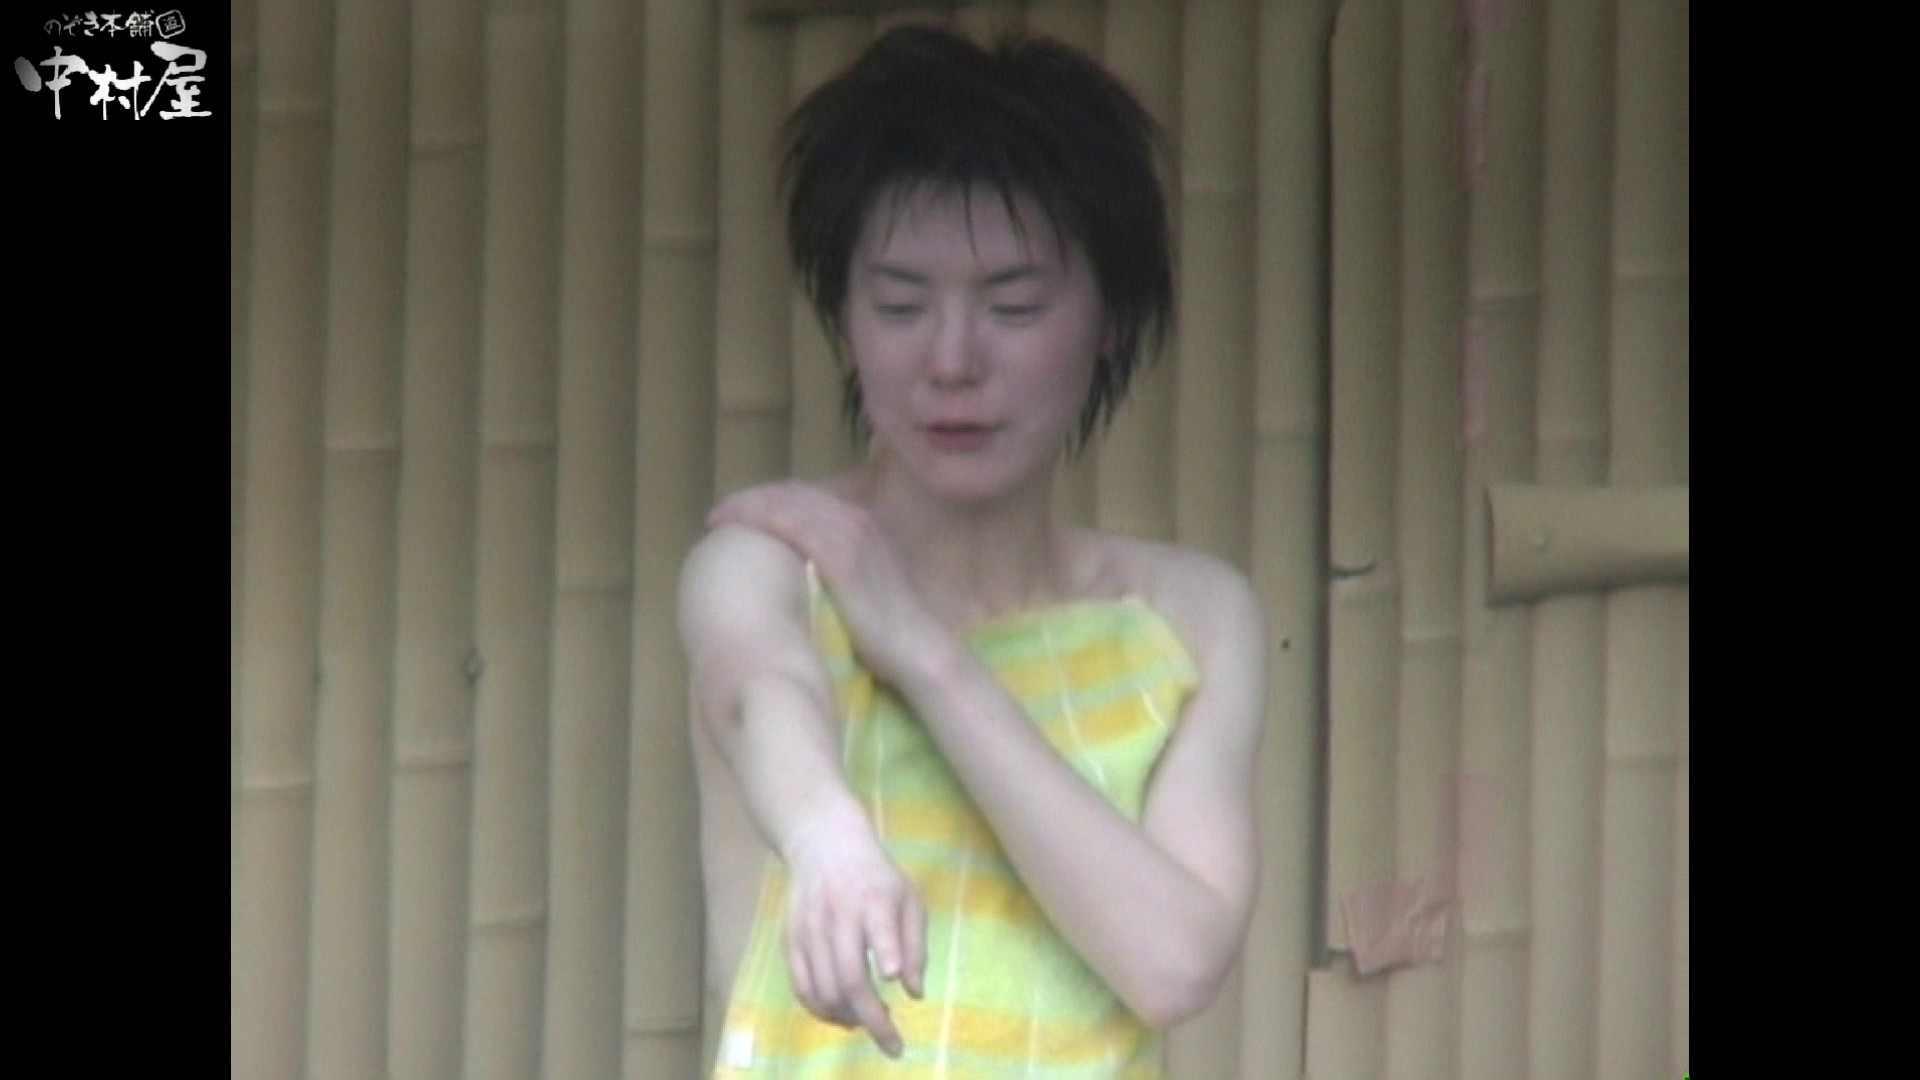 Aquaな露天風呂Vol.938 0 | エッチな盗撮  111pic 109